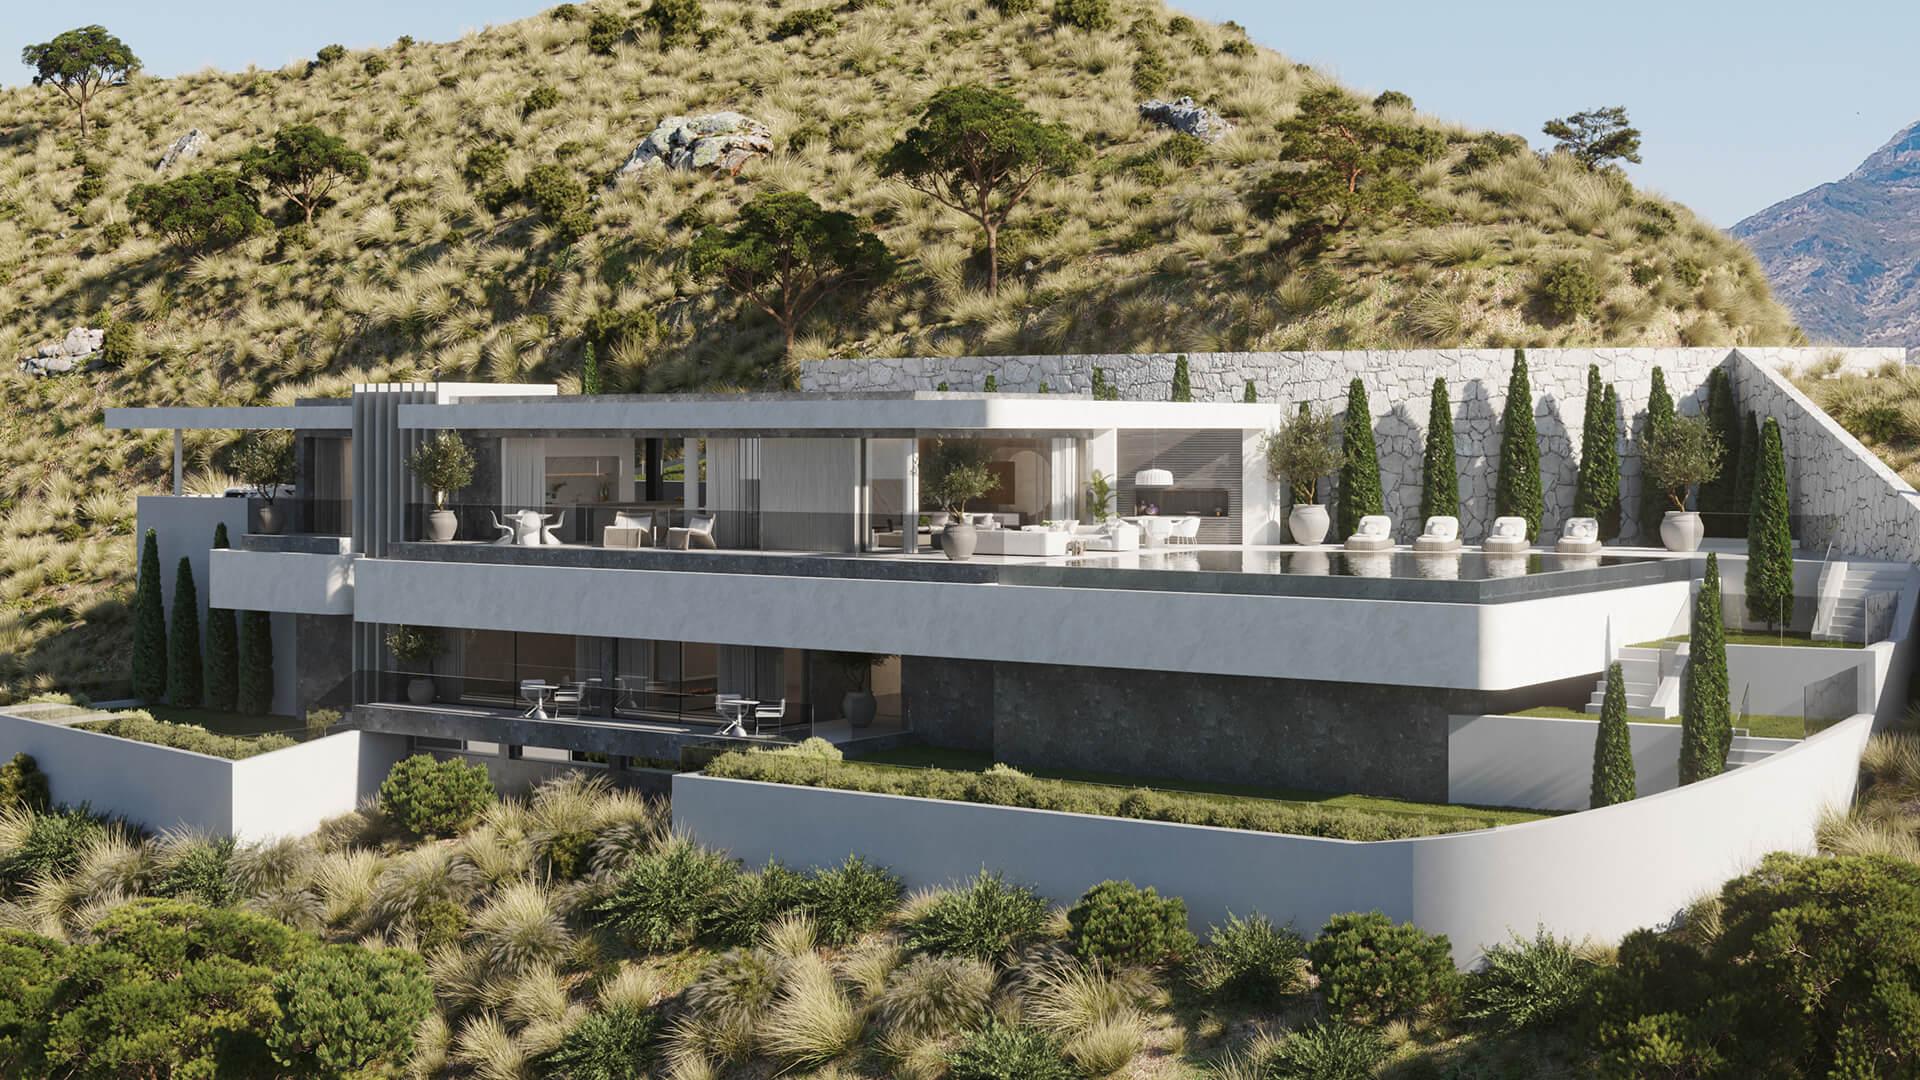 18 New Luxury Villas For Sale - Benahavis